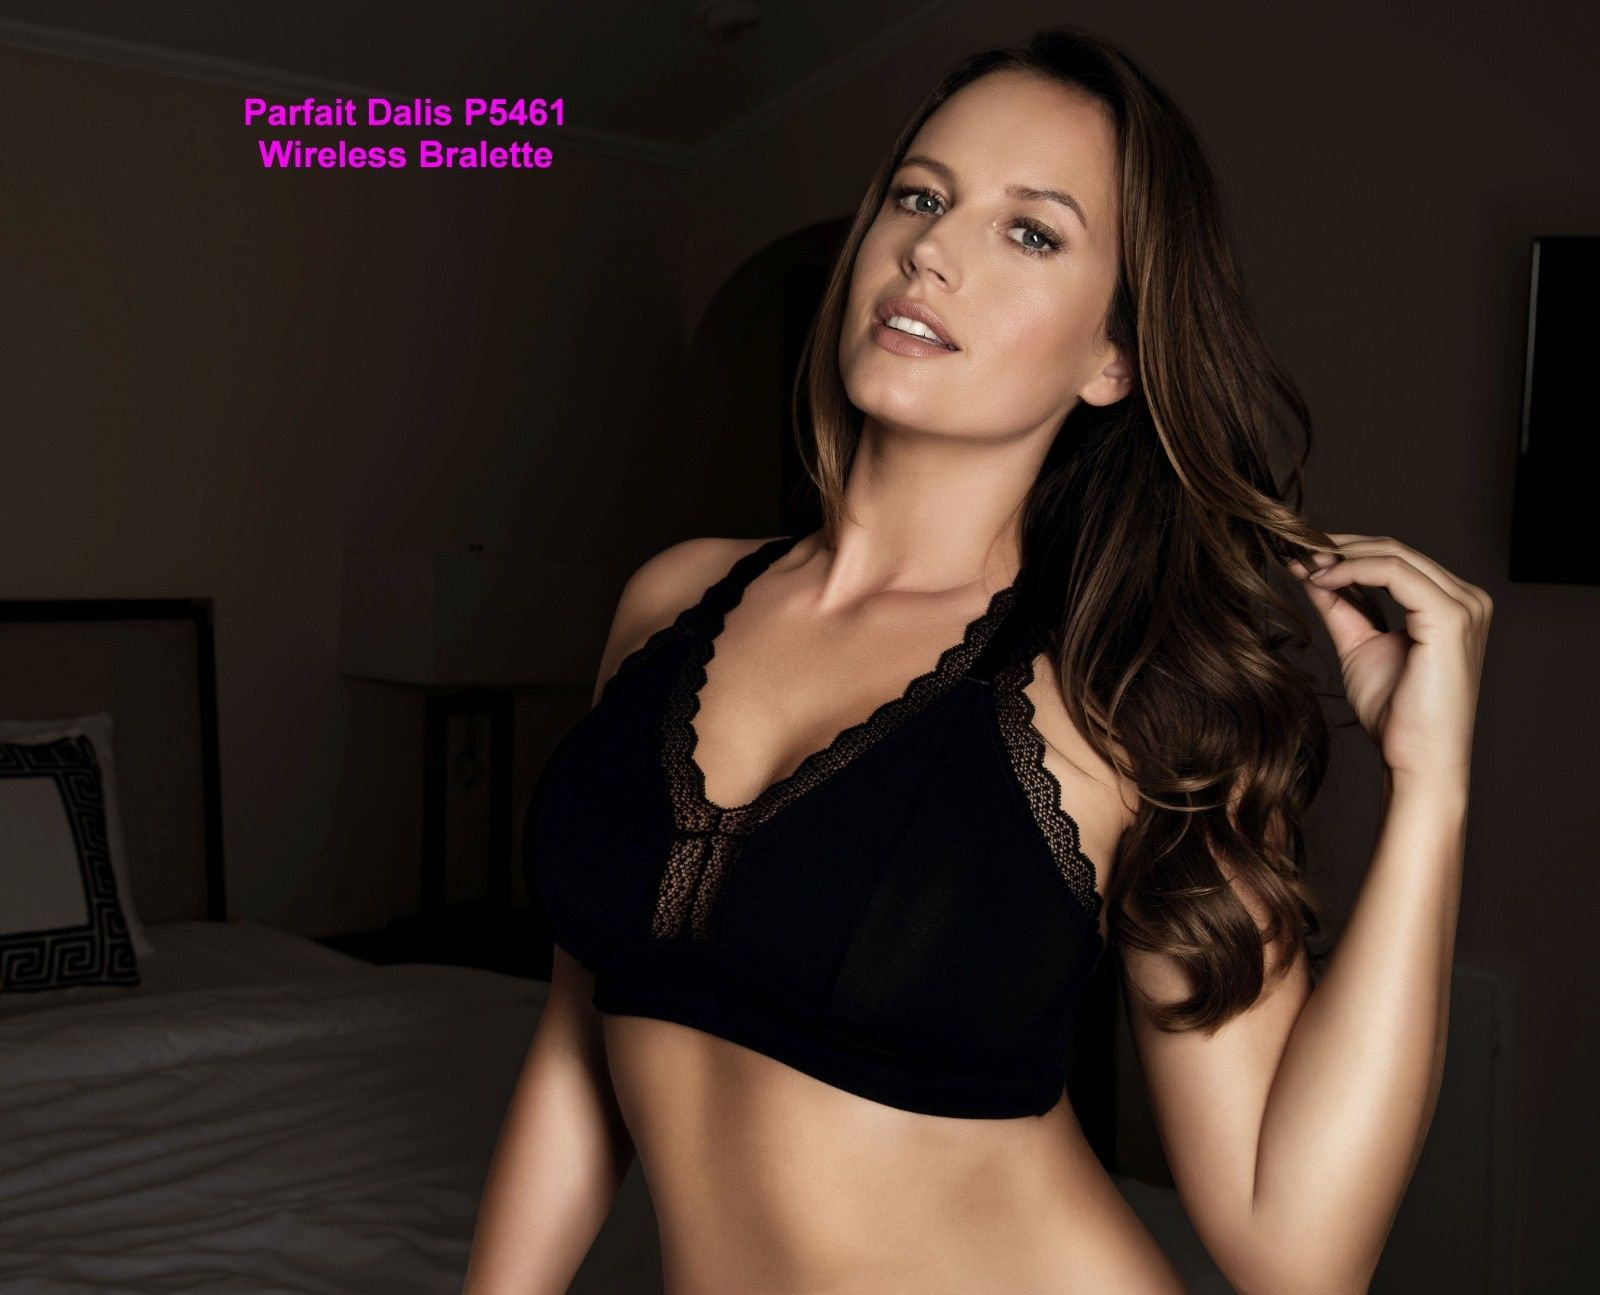 IN STOCK NWT Parfait Dalis P5641 Modal Wirefree Bralette Pink Blush